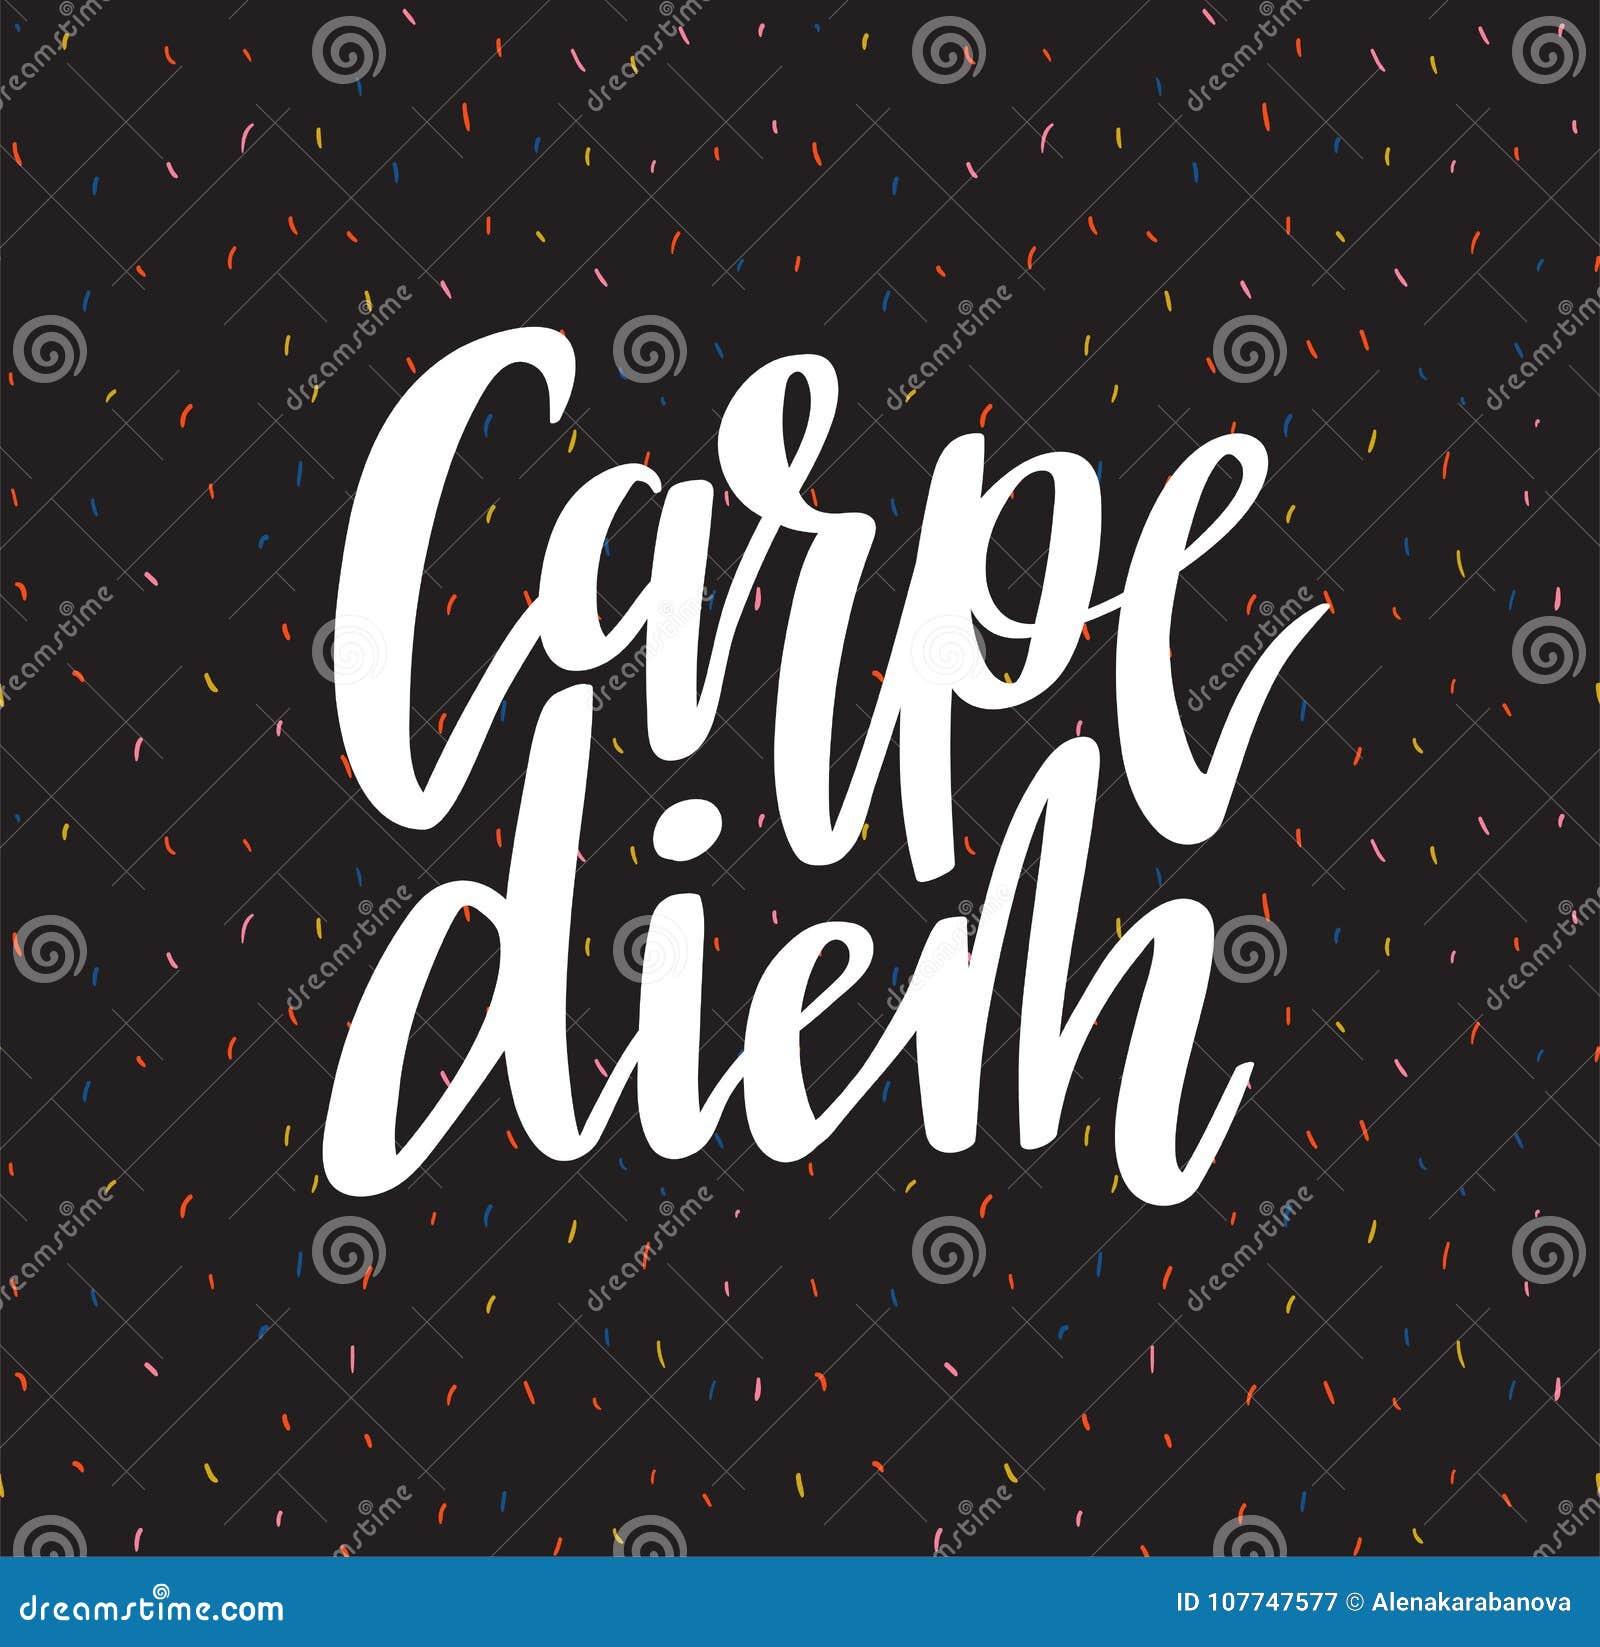 dc0040c8e031 Θετικό απόσπασμα εγγραφής Carpe diem γραπτό χέρι εμπνευσμένη λατινική φράση  στο υπόβαθρο κομφετί επίσης corel σύρετε